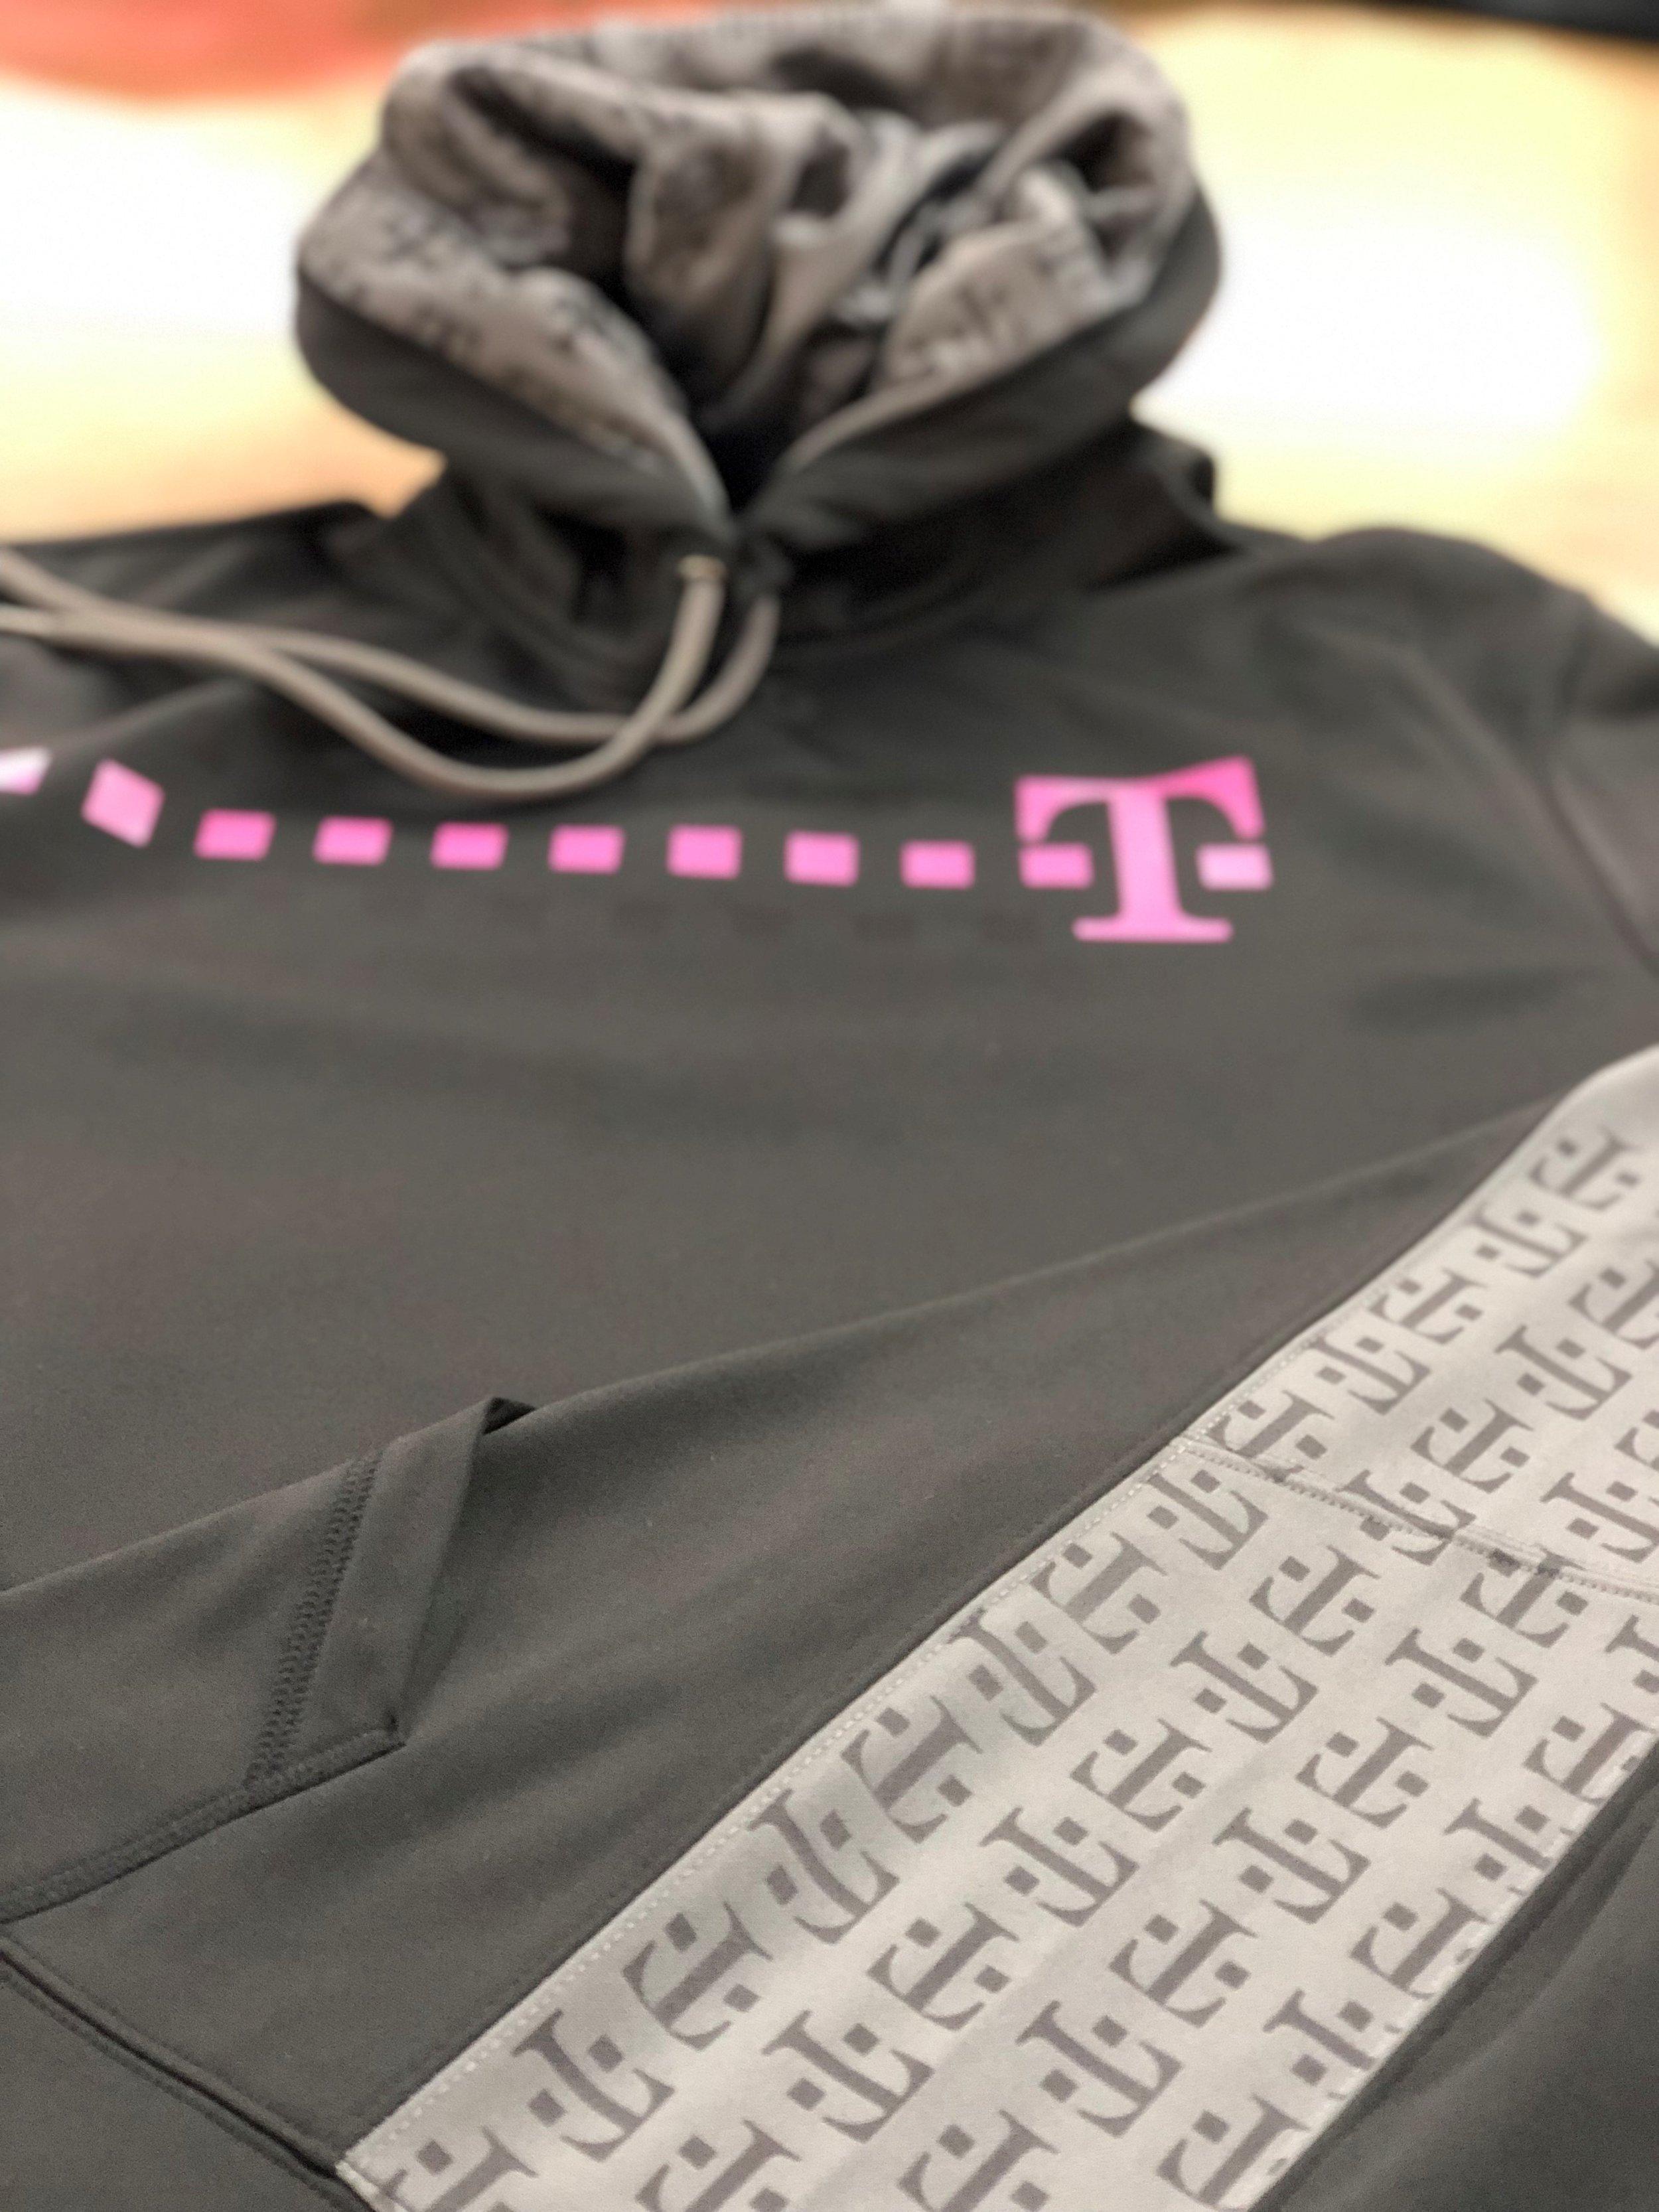 logounltd_laser_embroidery_screen_printing_apparel_uniform_custom_tshirts_kirkland_bellevue_seattle_redmond_branded_merchandise_promotional_products_logo_unltd_t_mobile_Tuesday_tmobile_un_carrier_magenta_5G_john_lege (14).jpg